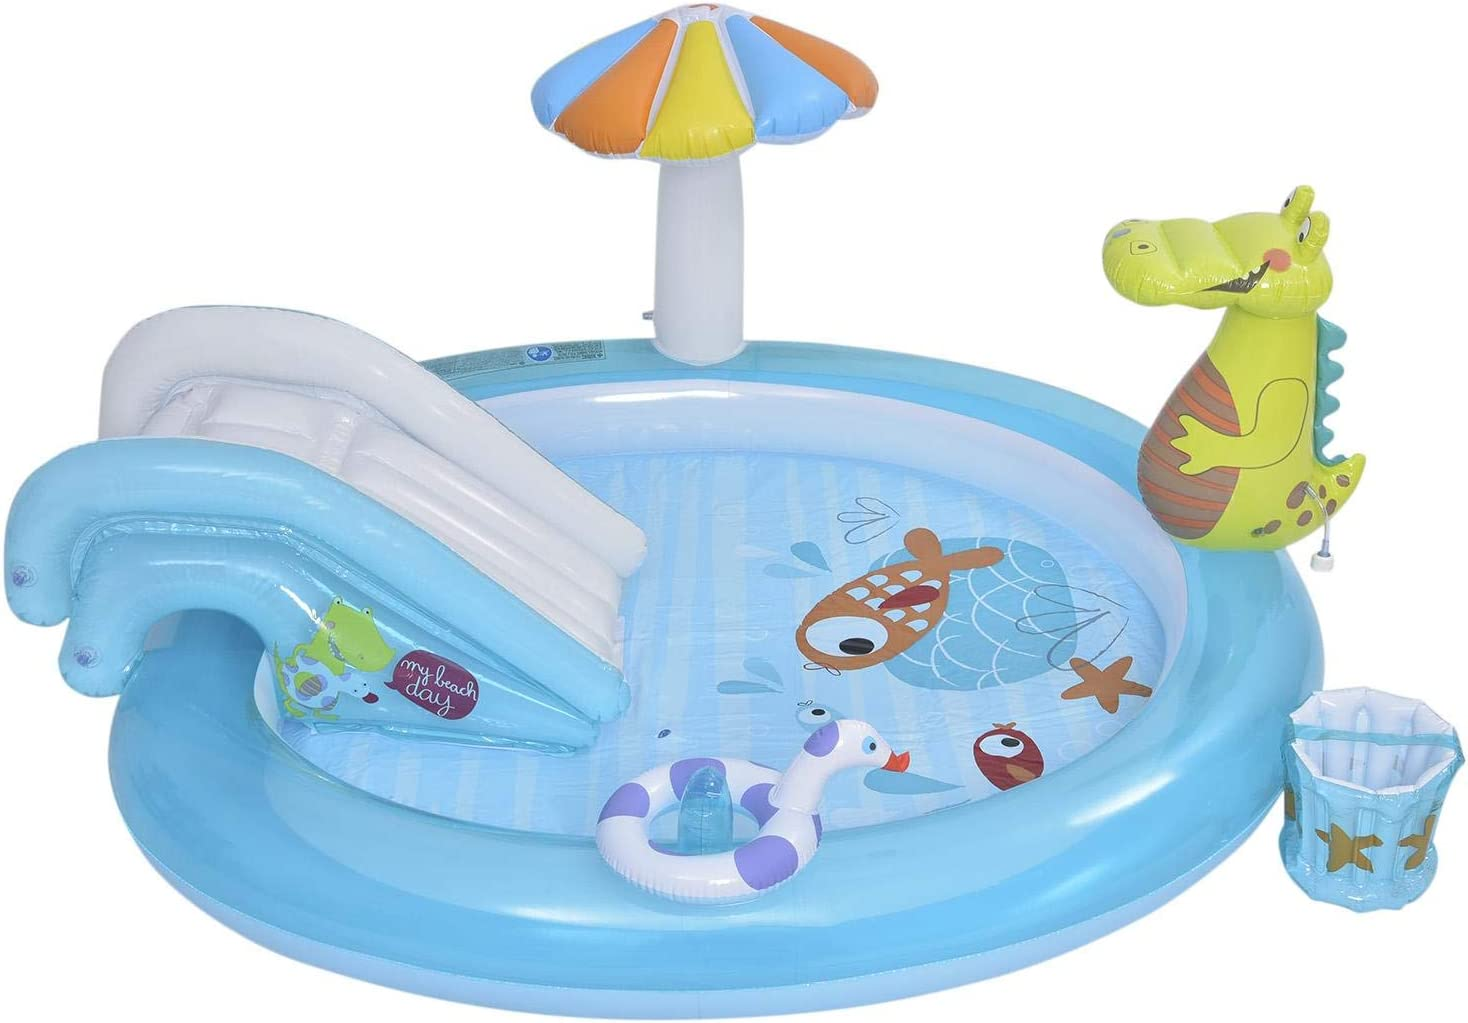 Sroomcla Tobogán acuático de cocodrilo Piscina Inflable Piscina Infantil Piscina Familiar para niños Piscina de Bolas oceánicas Centro de Juegos Inflable Value